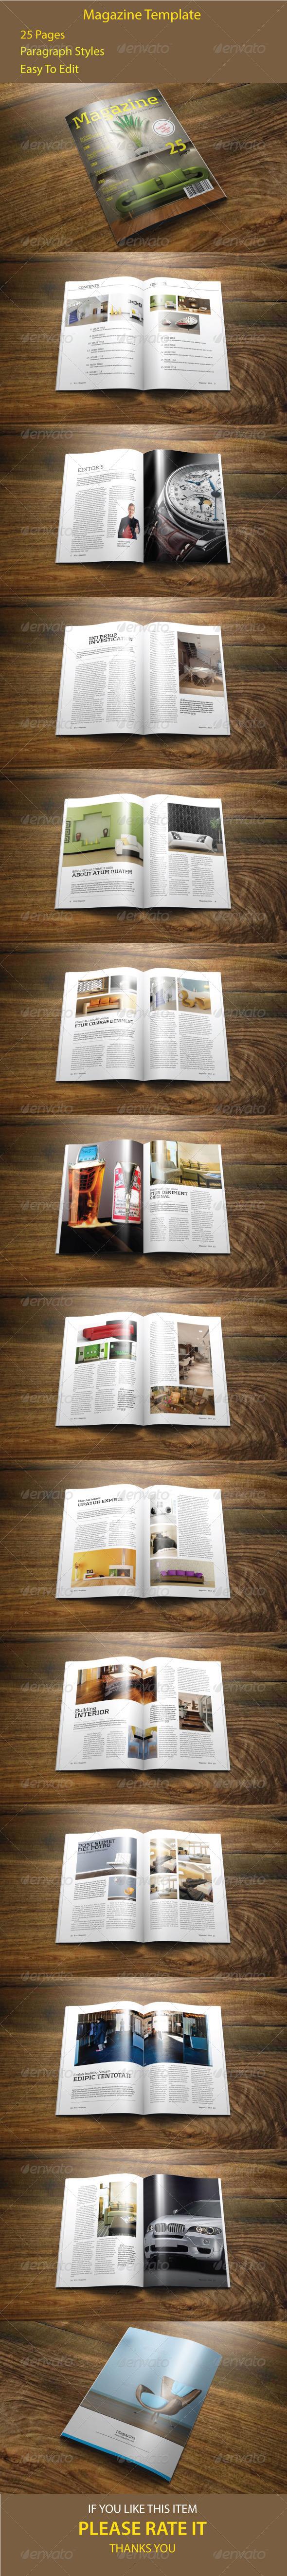 GraphicRiver Indesign Magazine Template 7062967